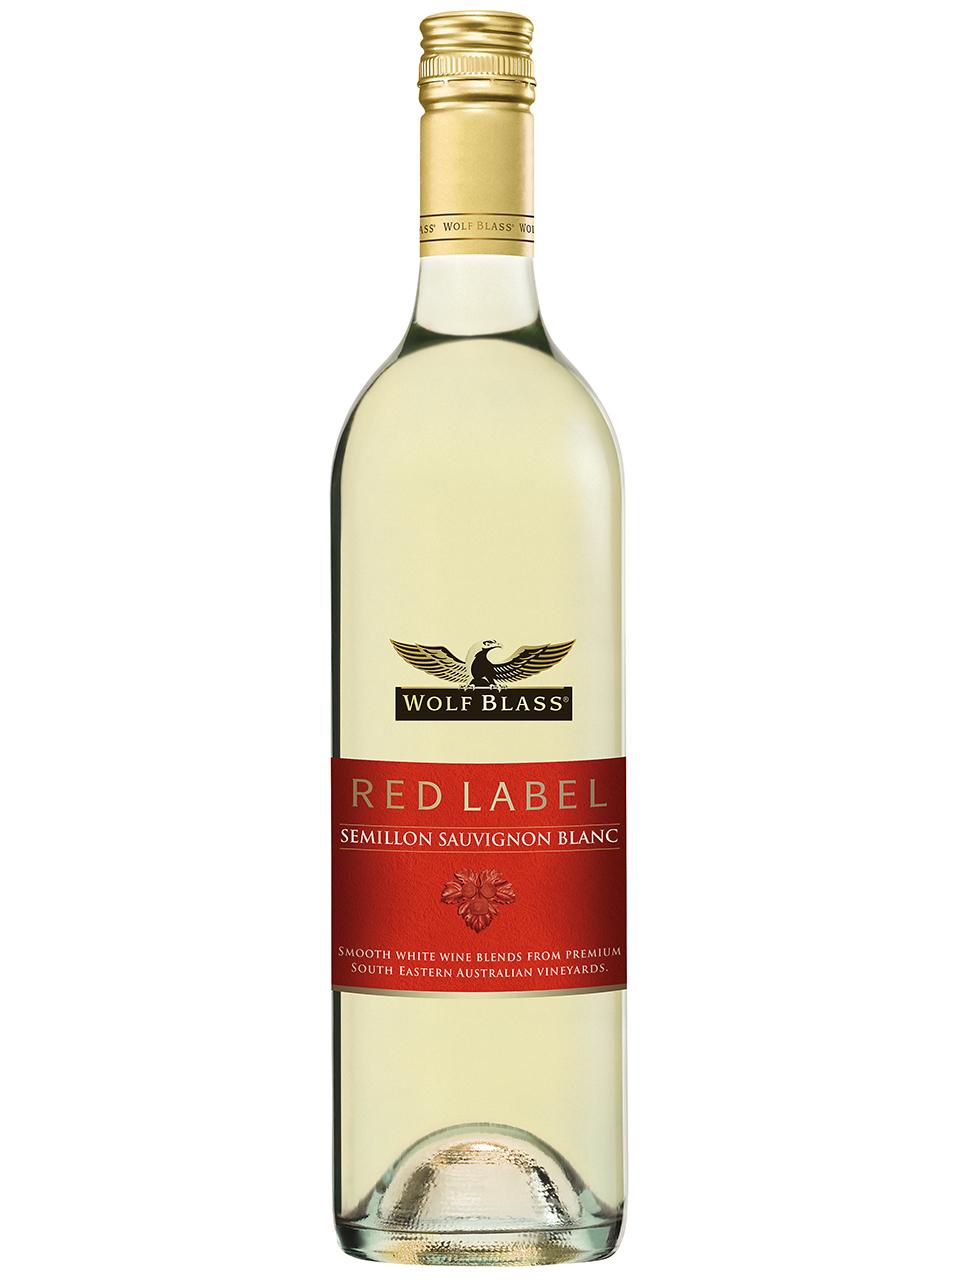 Wolf Blass Red Label Semillon Sauvignon Blanc